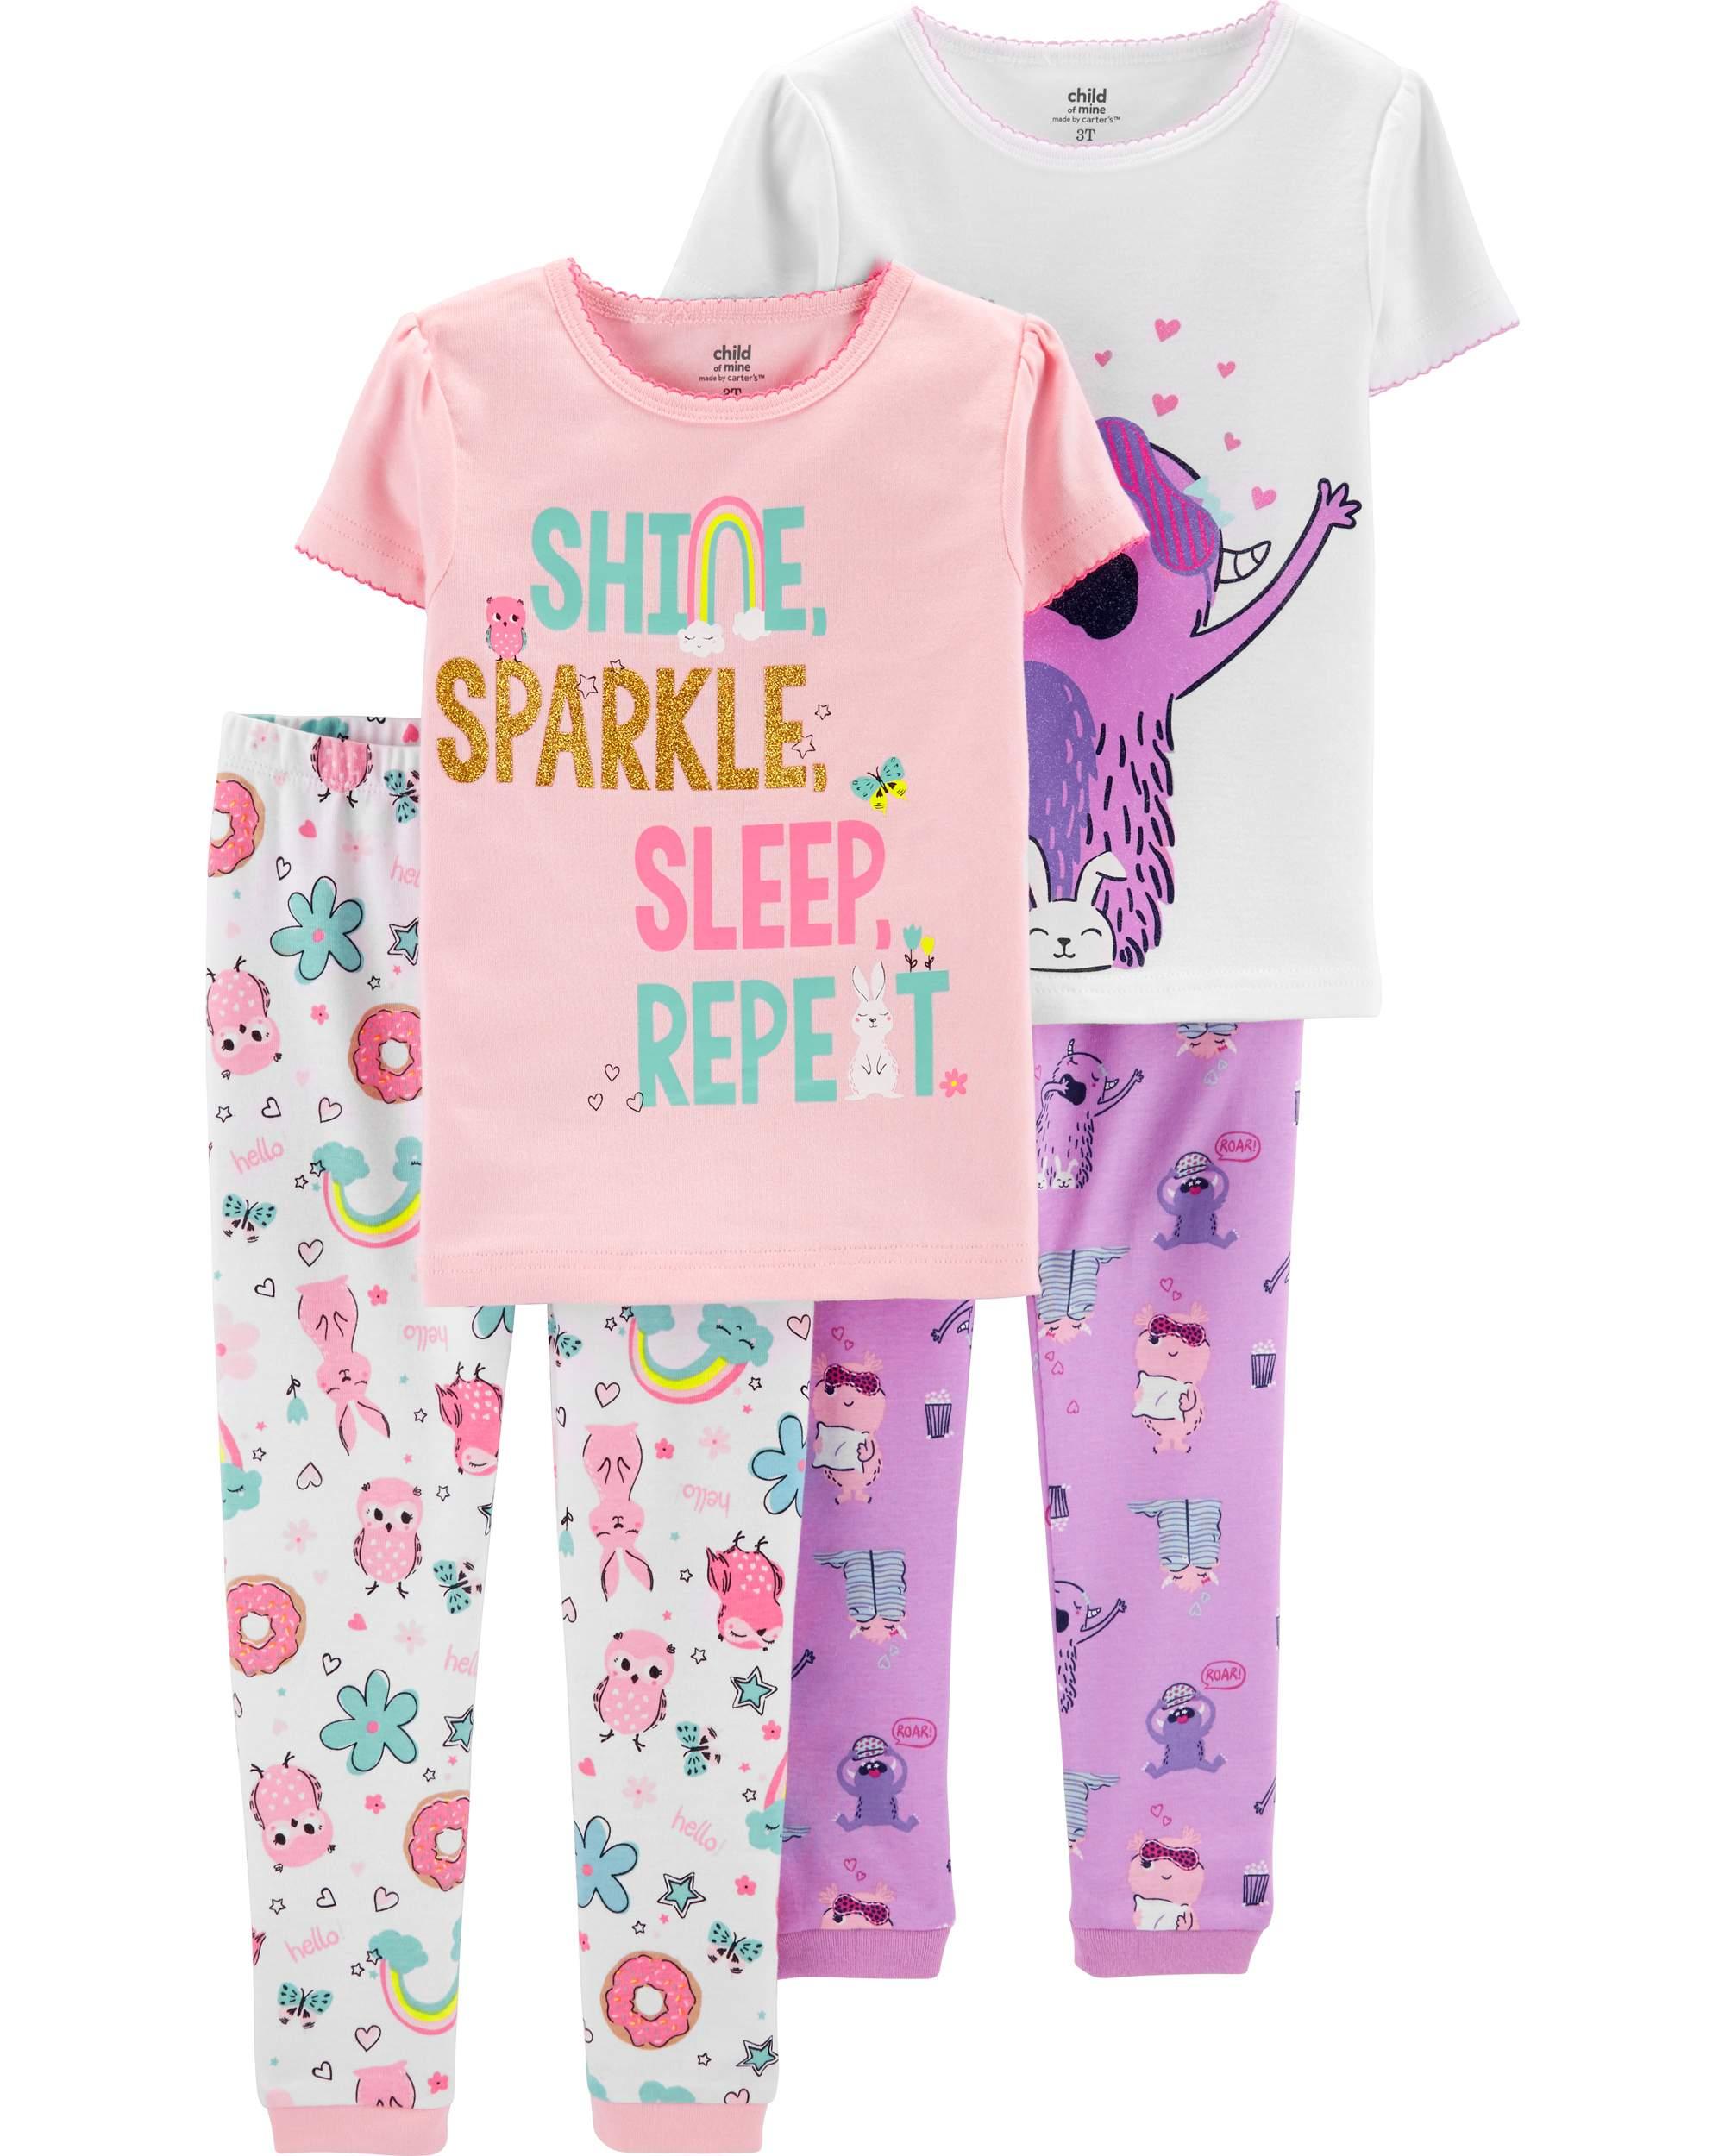 Short Sleeve Cotton Tight Fit Pajamas, 4pc Set (baby girls)